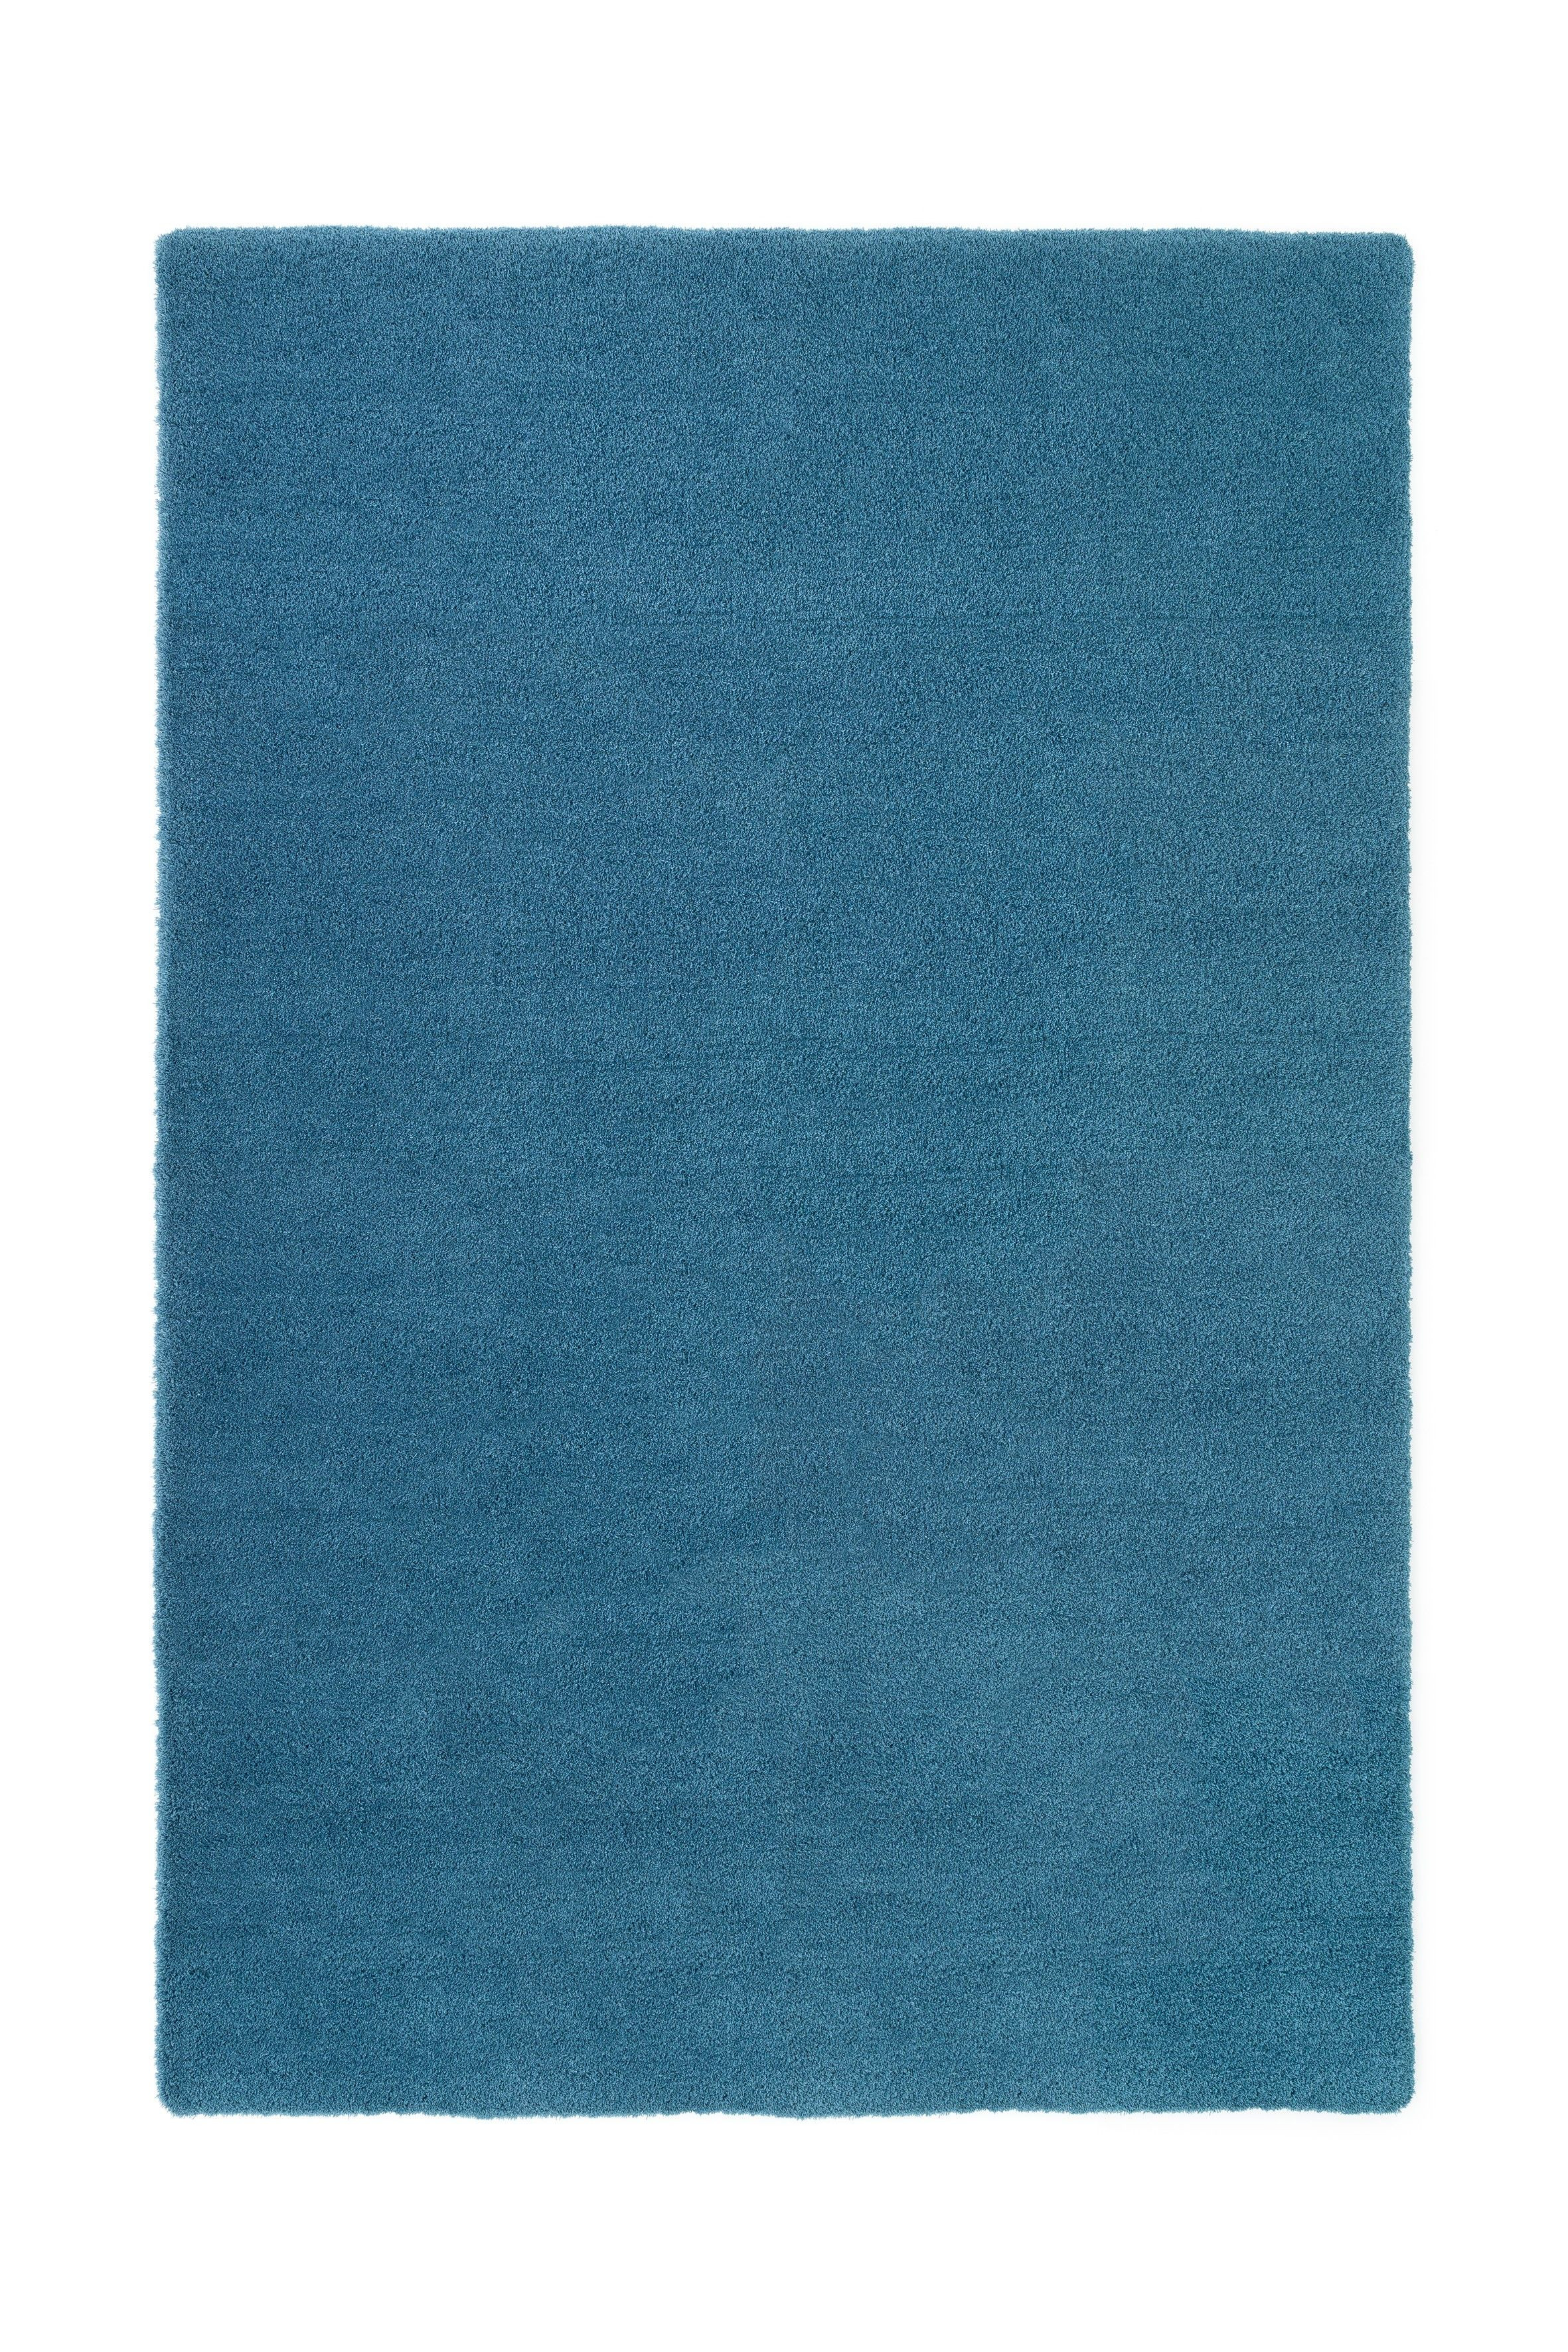 Astra - Golze koberce Kusový koberec Livorno 023 Turquoise - 120x180 cm